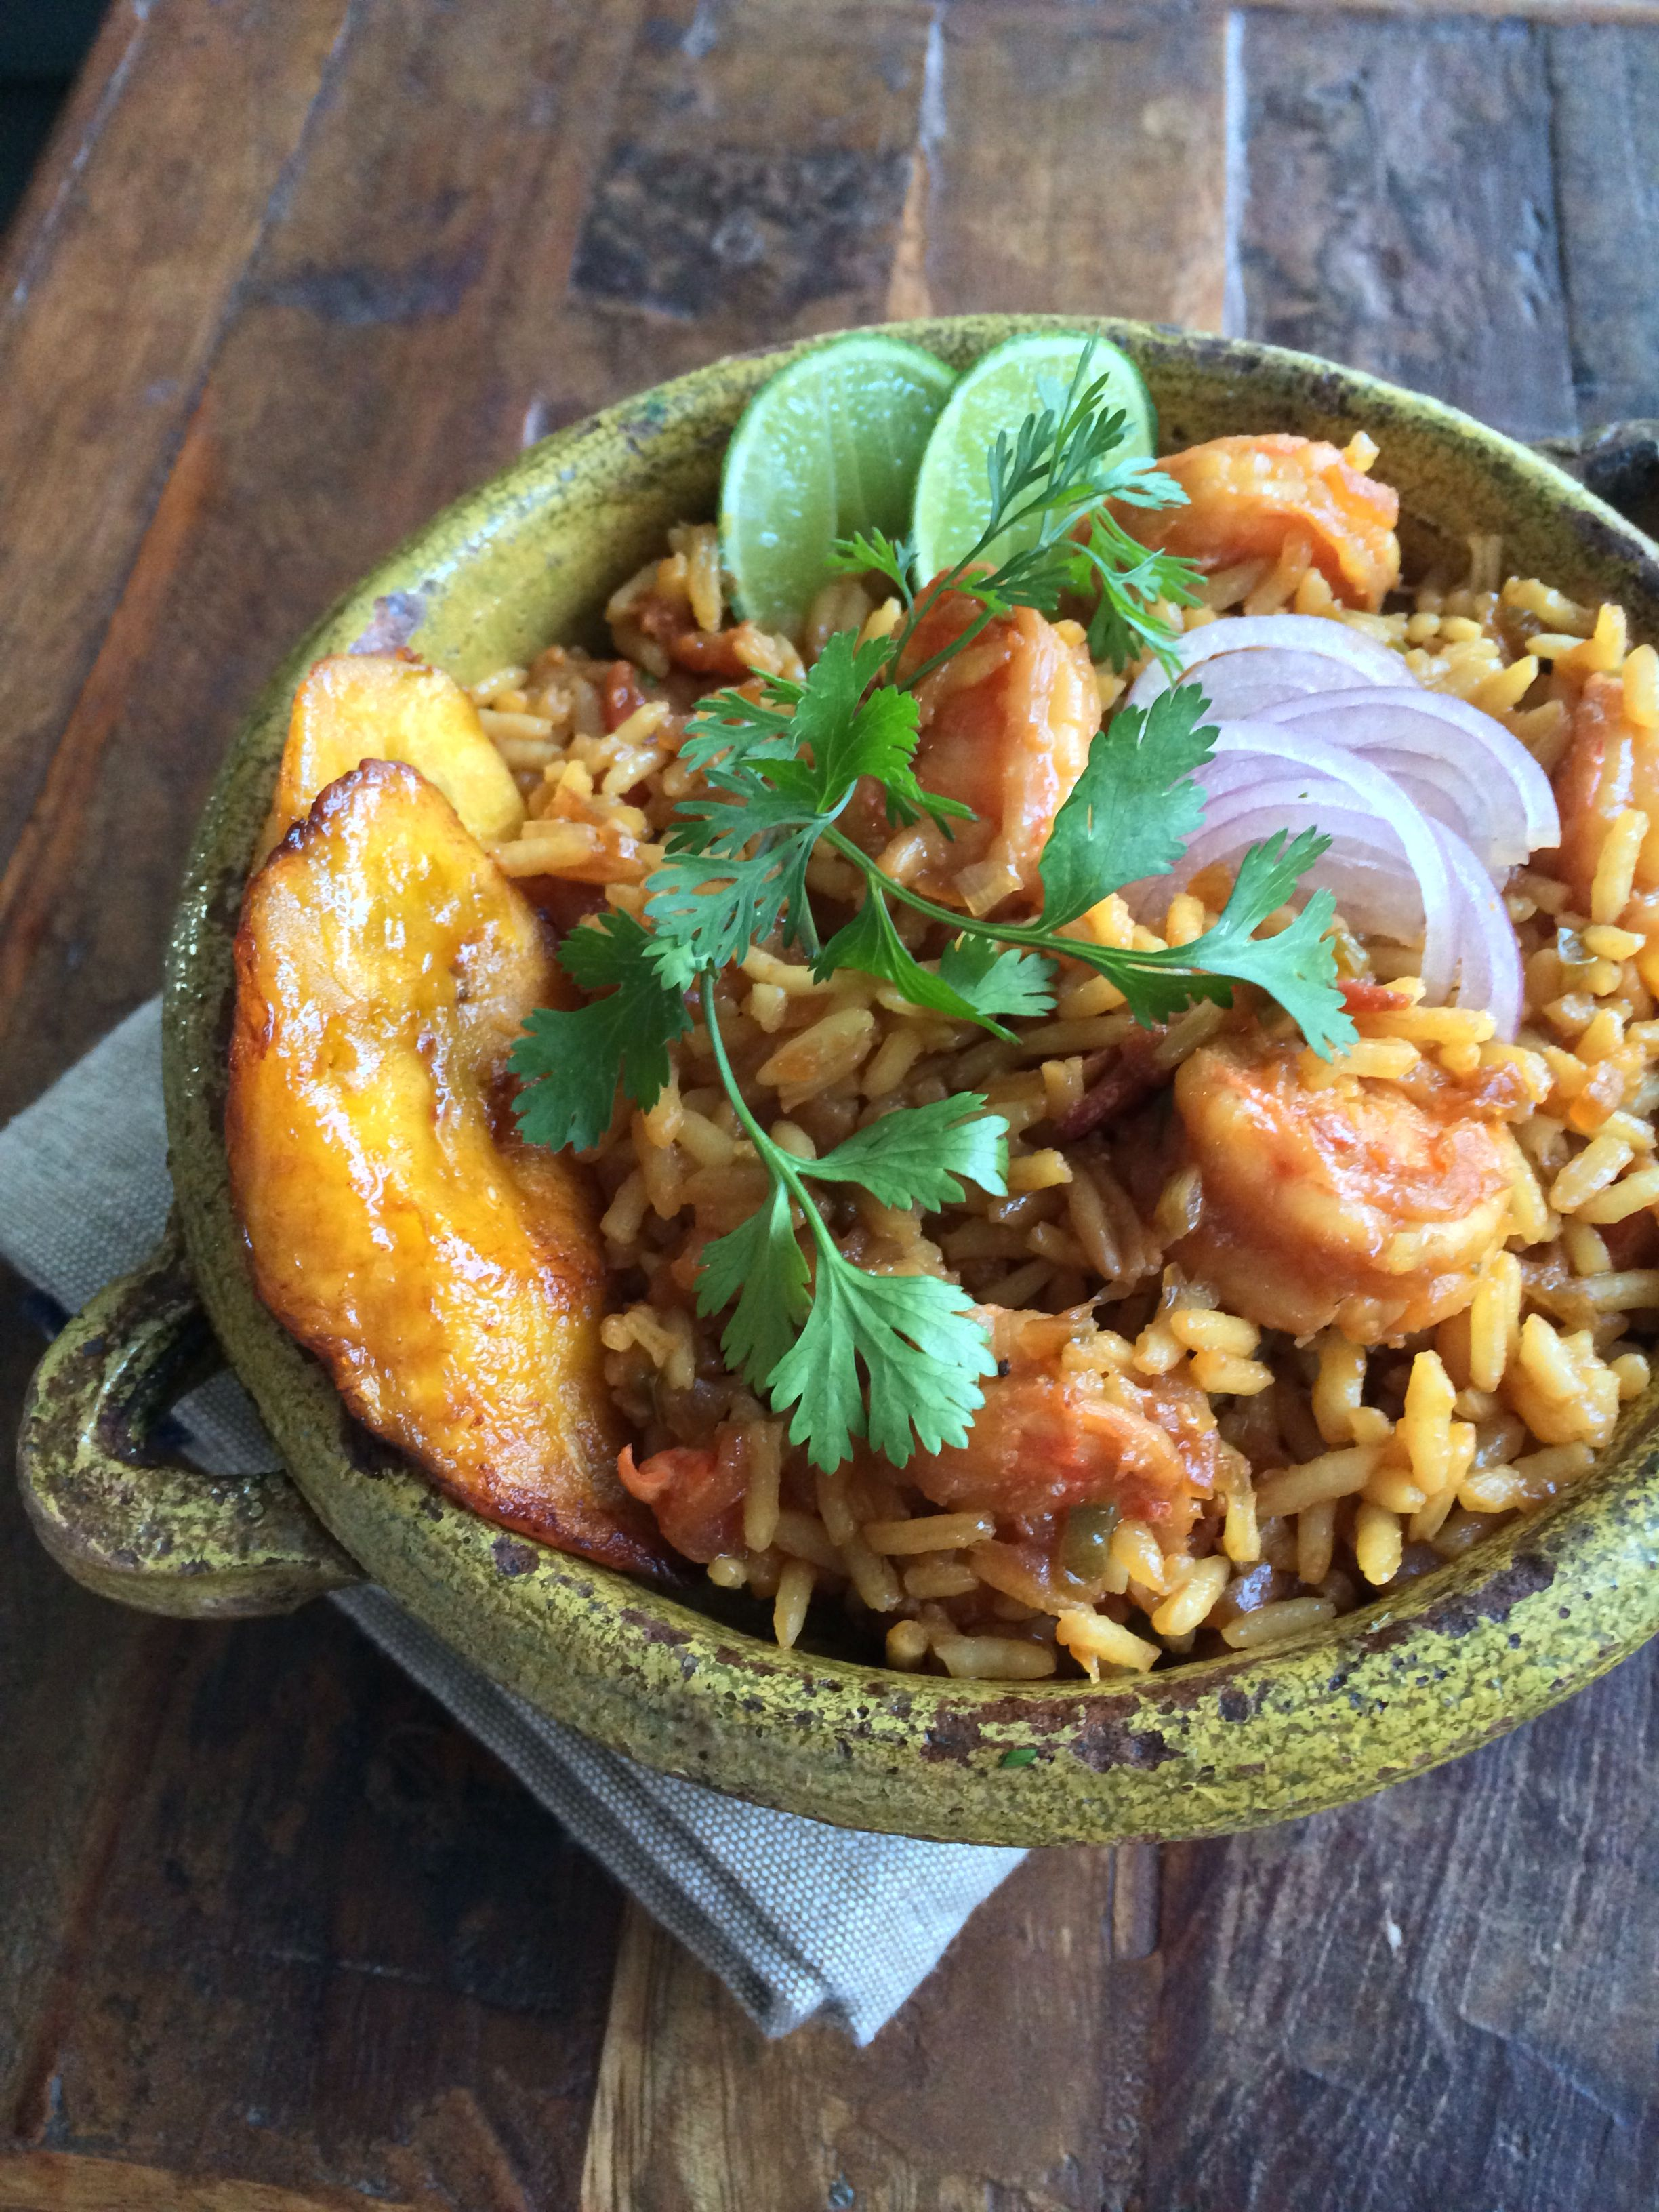 Arroz  Camarones  Latino Food Bloggers  Our latest recipes  Latin food Latin american food y Latin cuisine